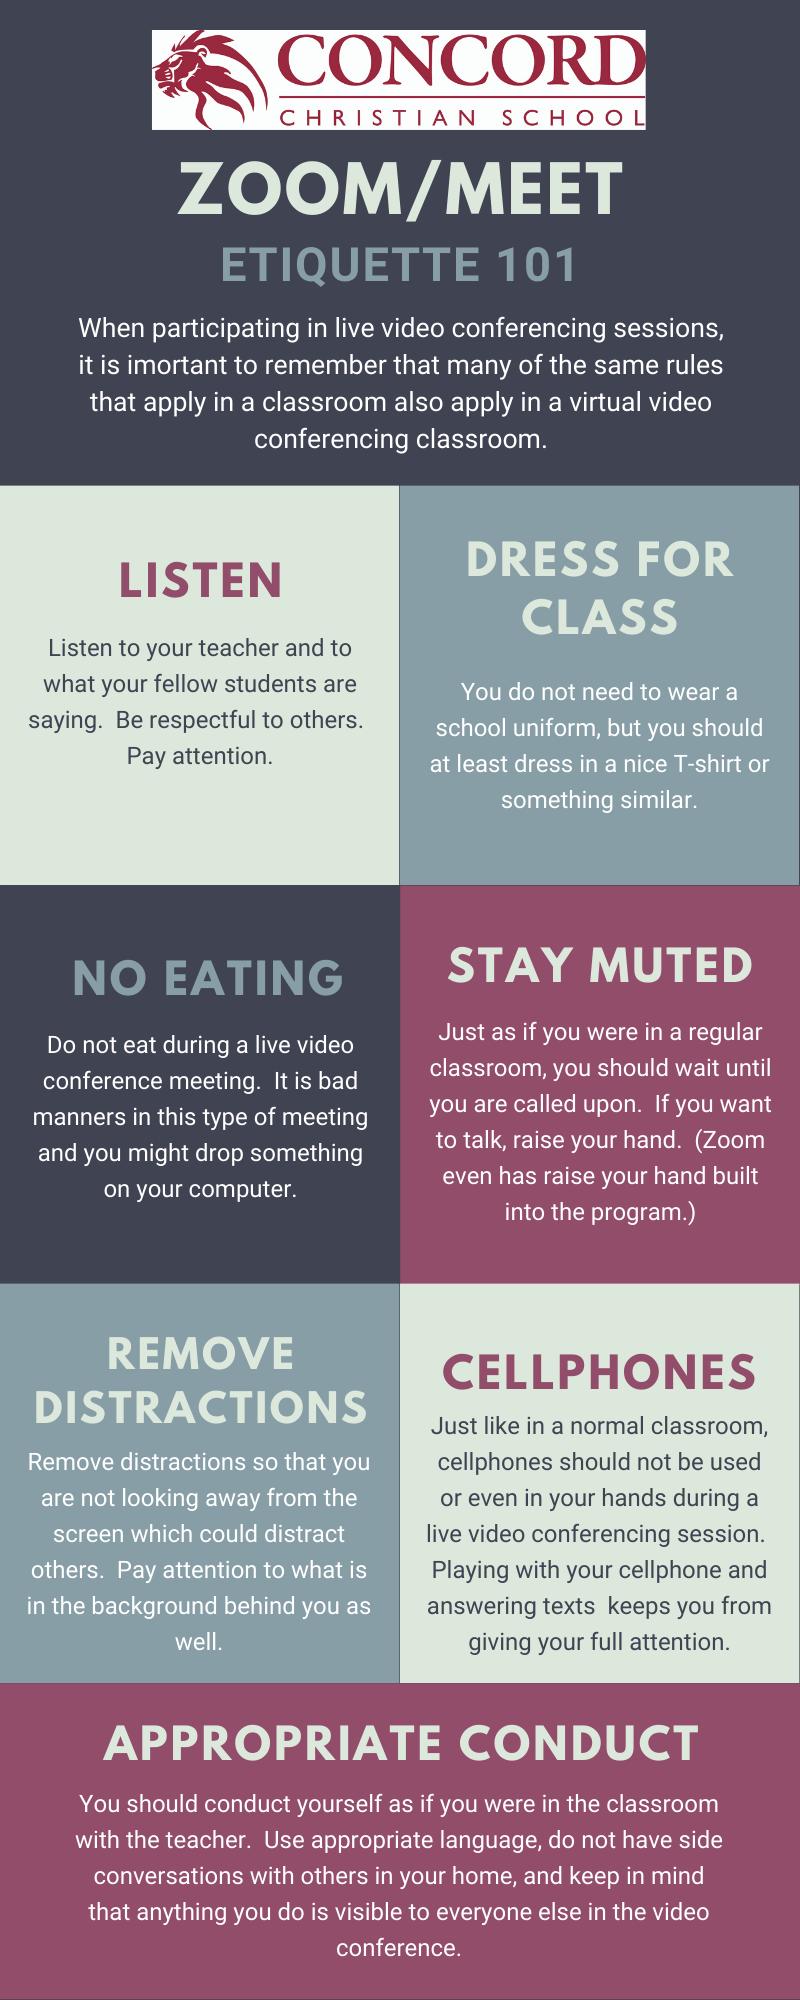 Zoom/Meet Etiquette 101